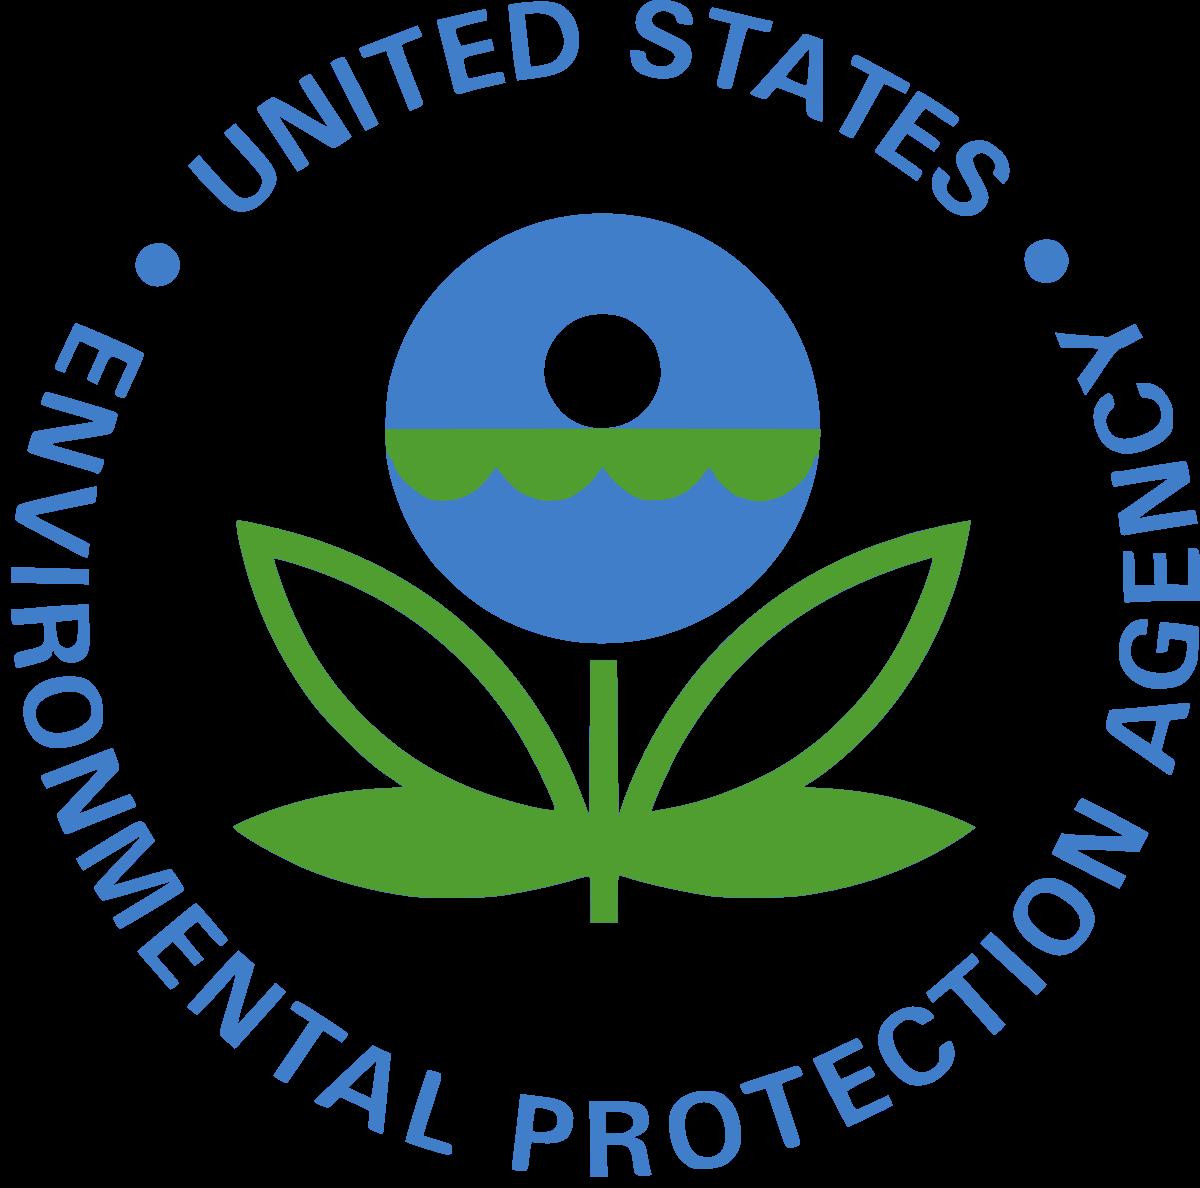 US Environmental Protection Agency